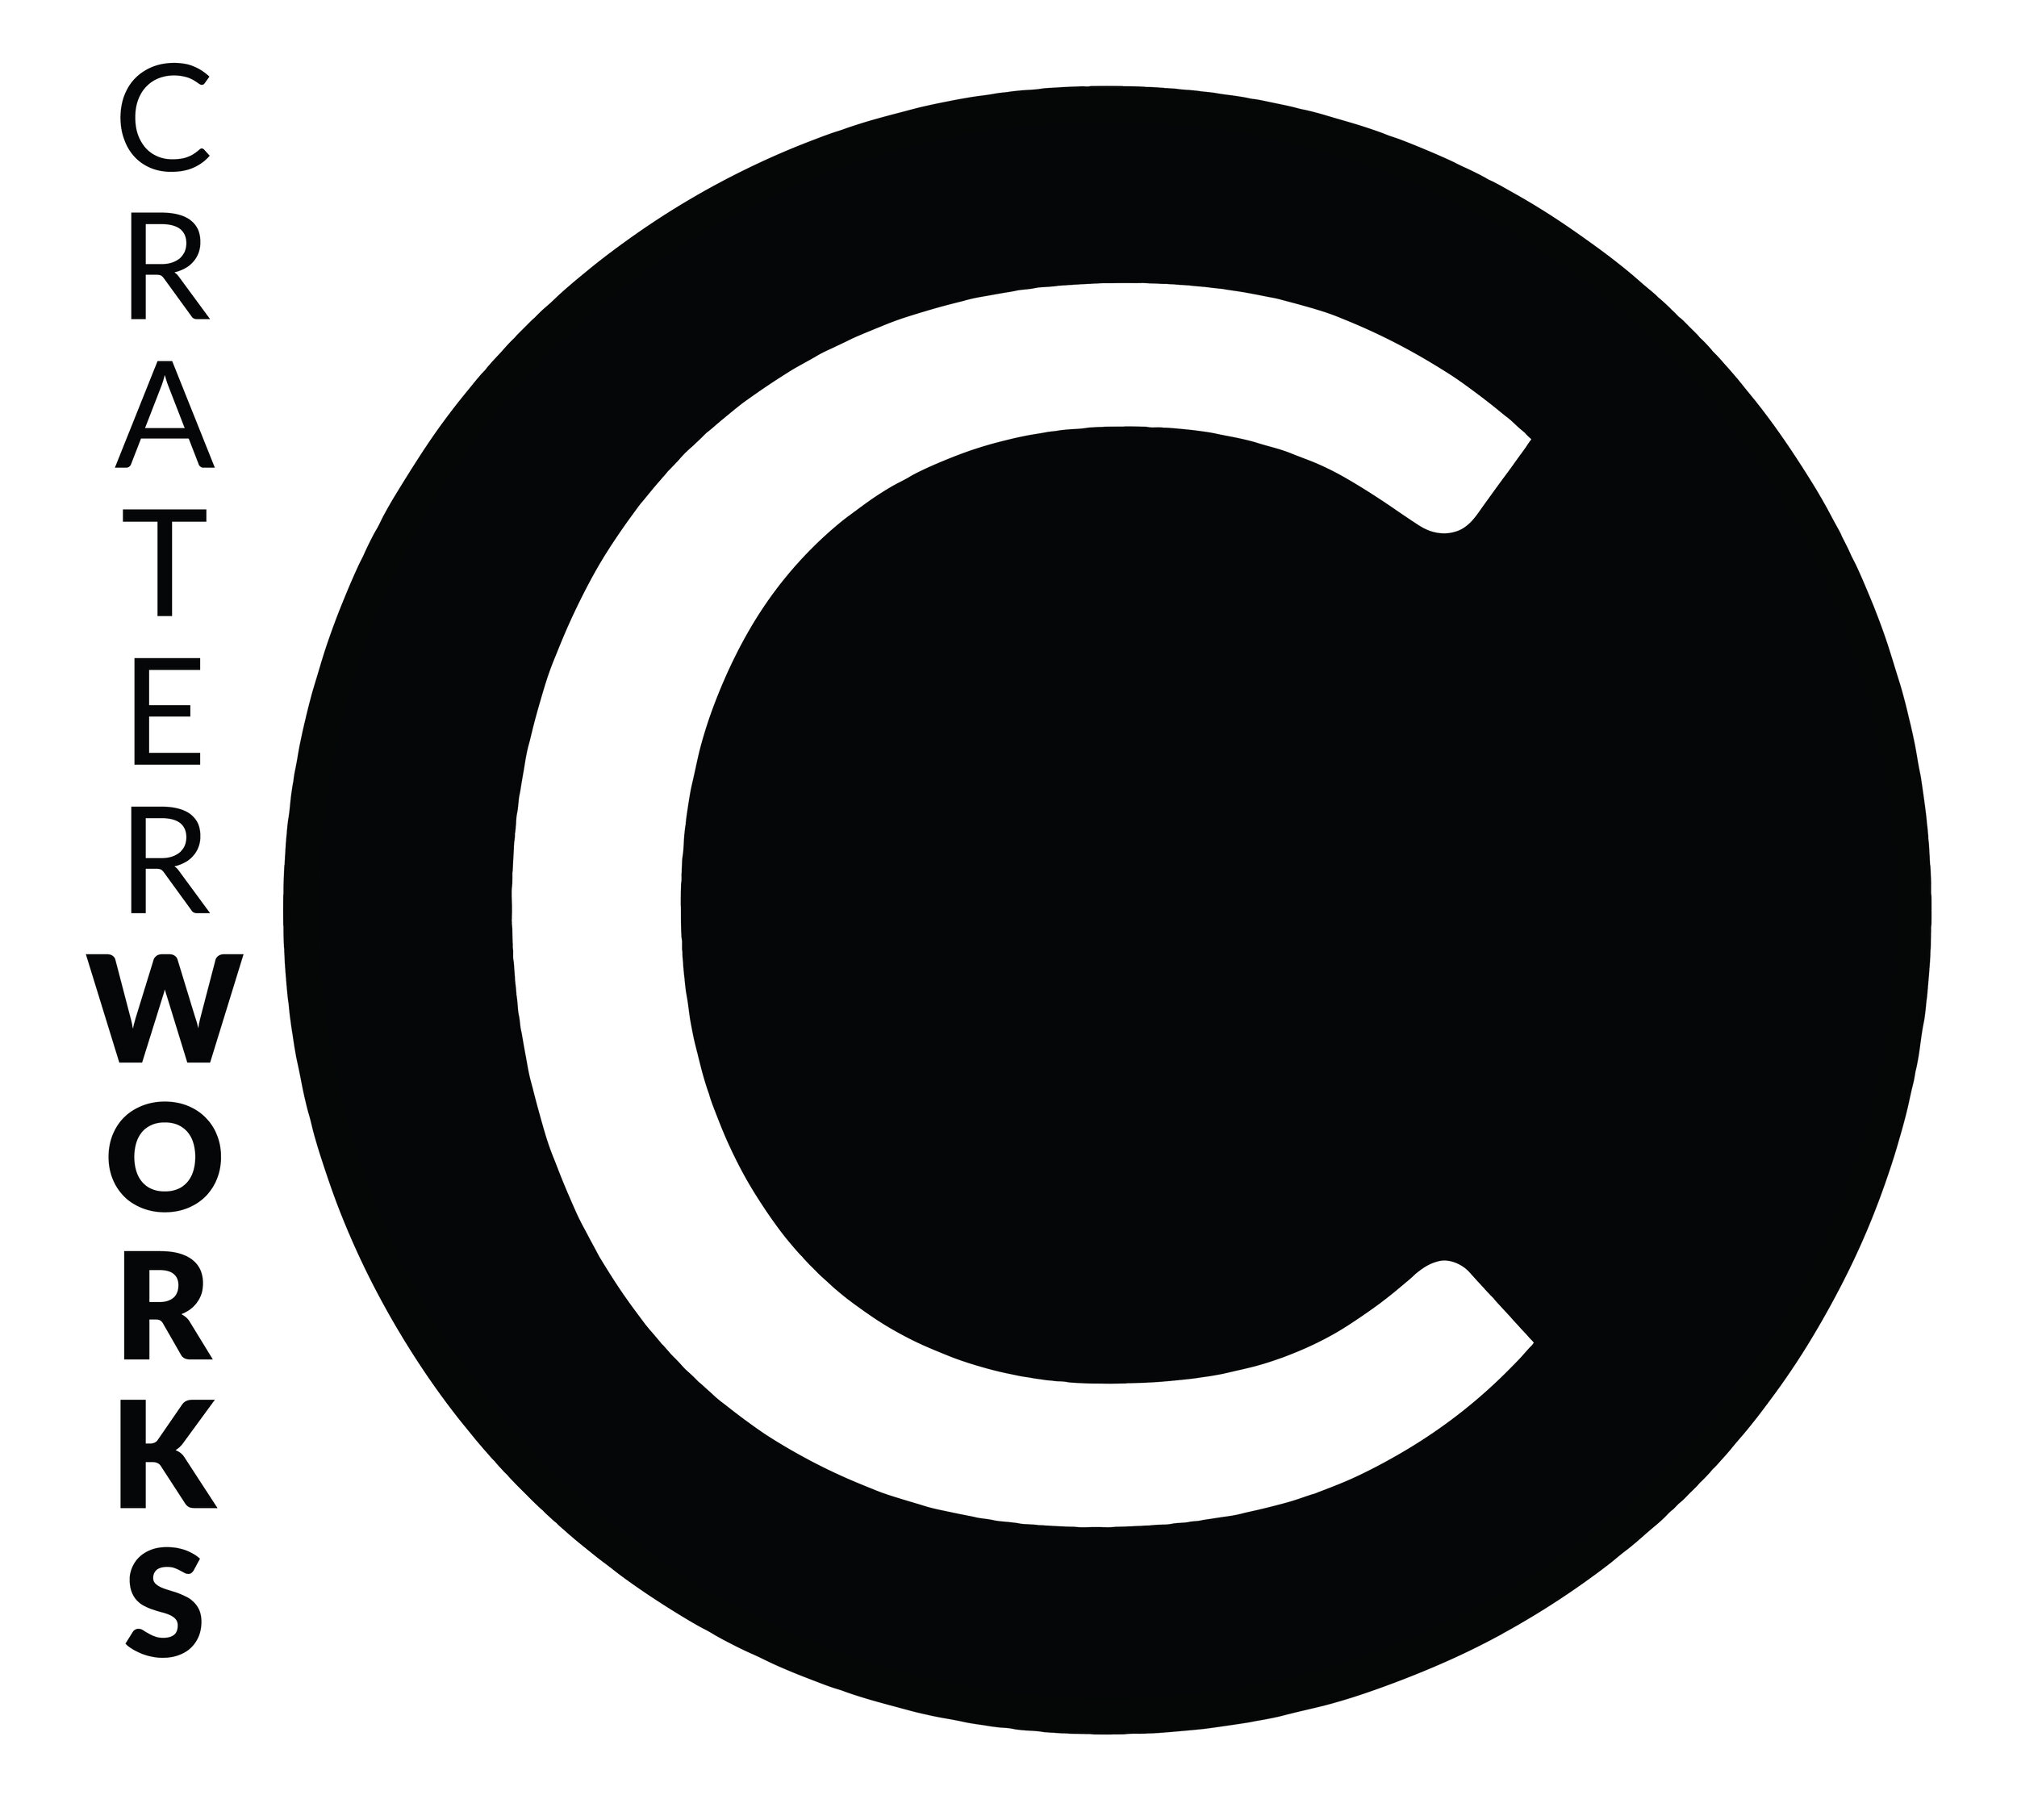 Craterworks